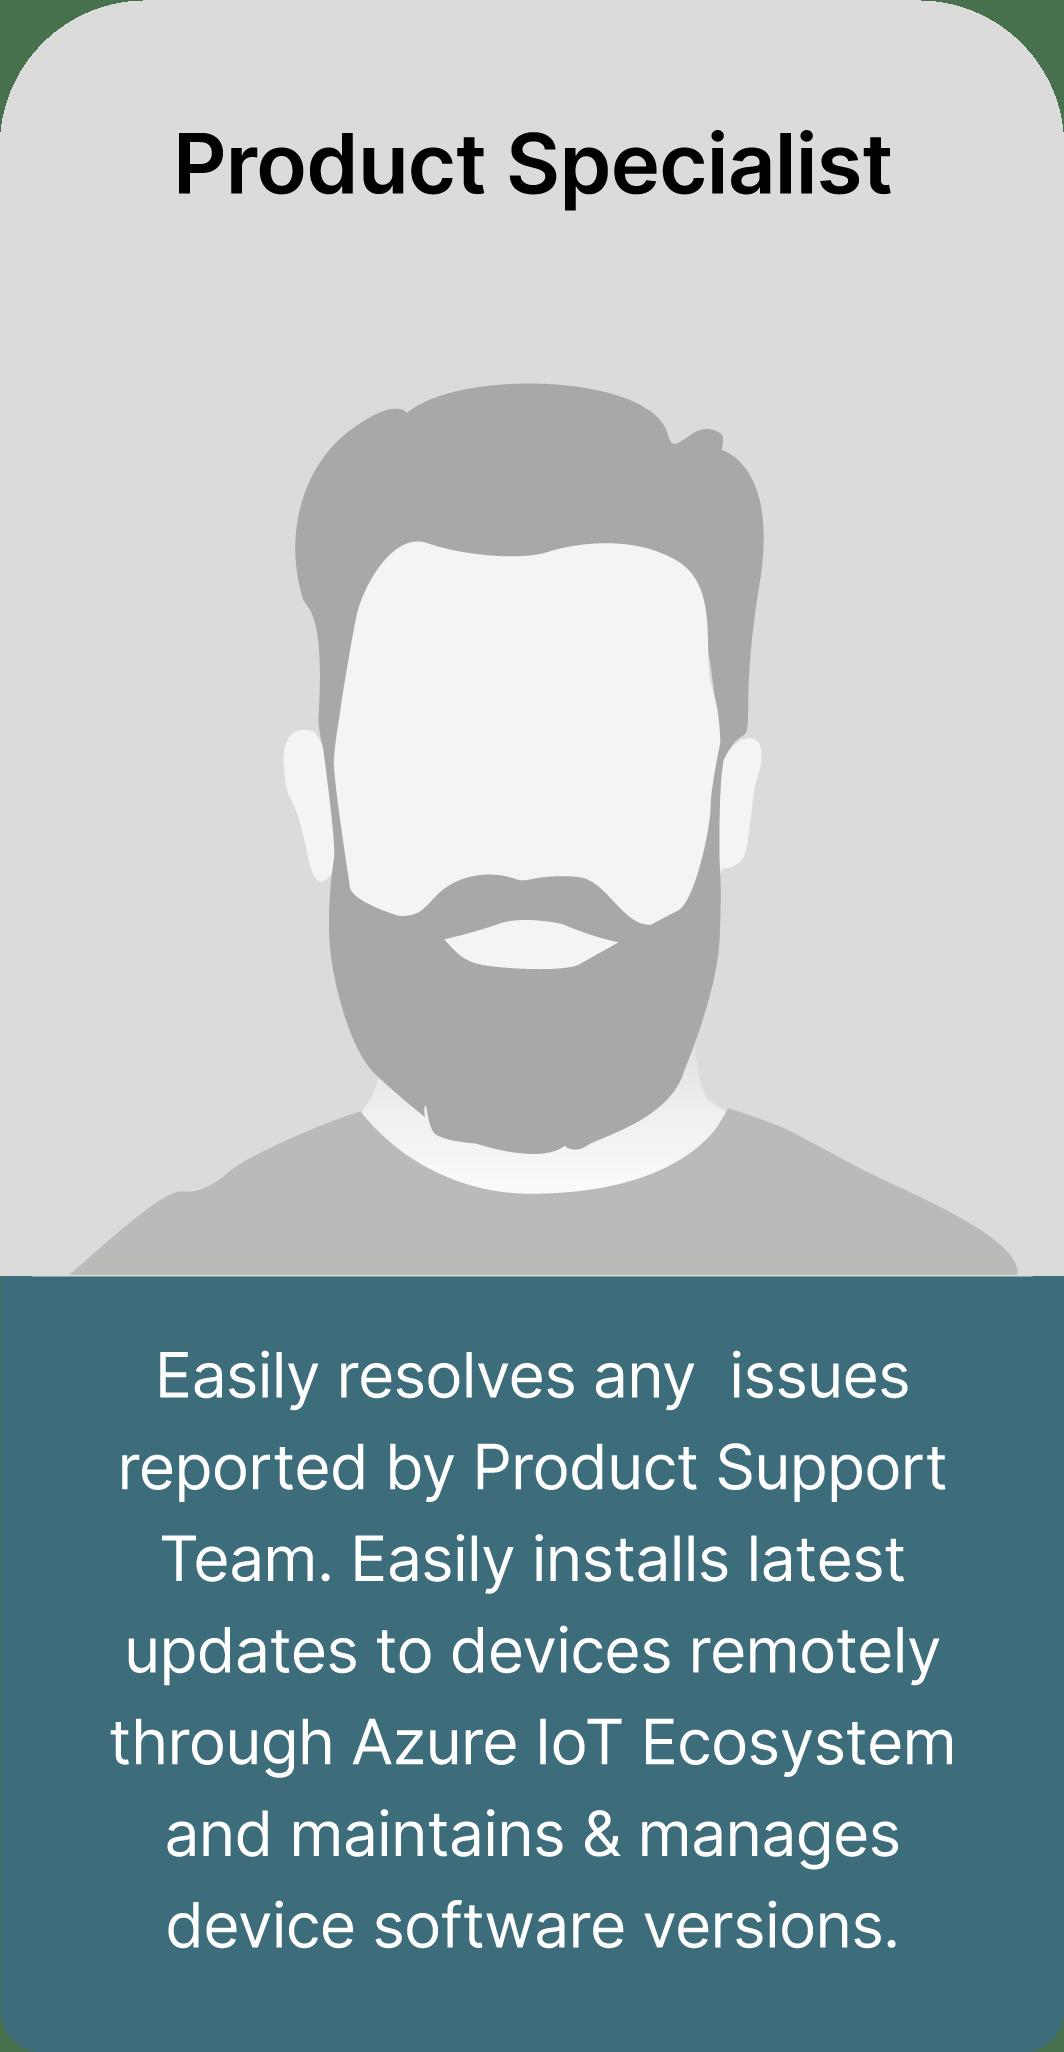 ProductSpecialist